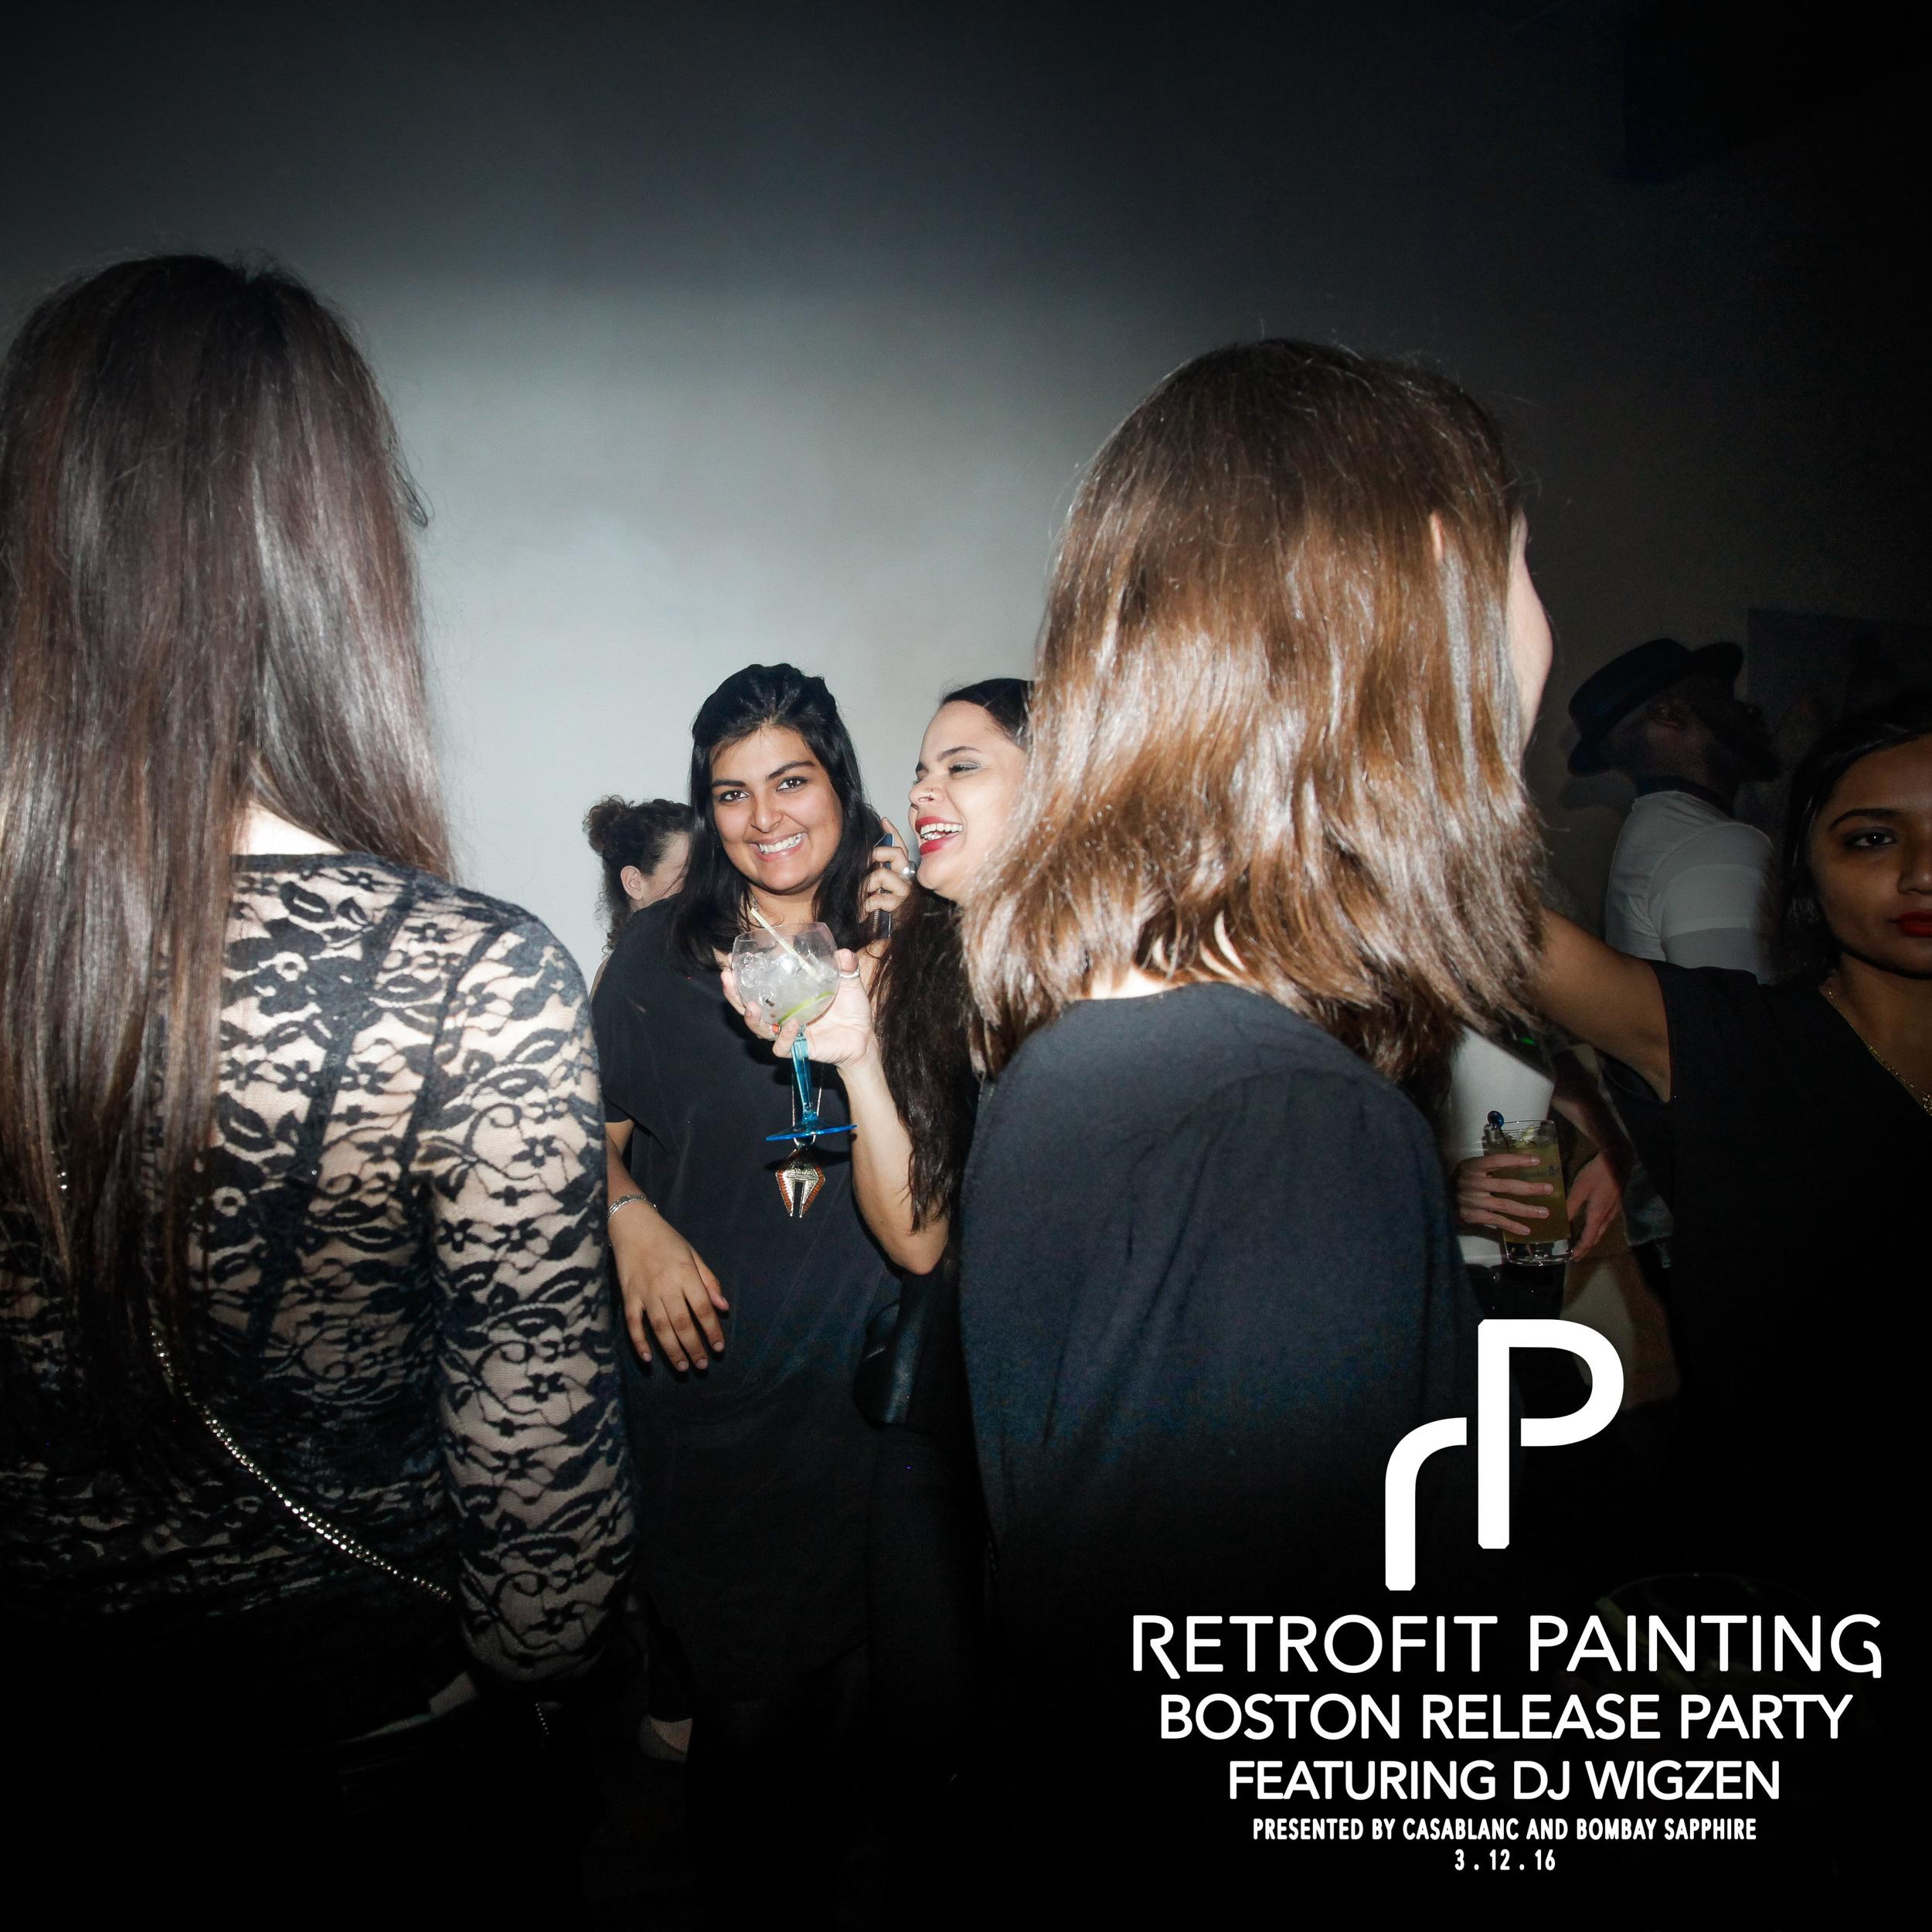 Retrofit Painting Boston Release Party 0143.jpg